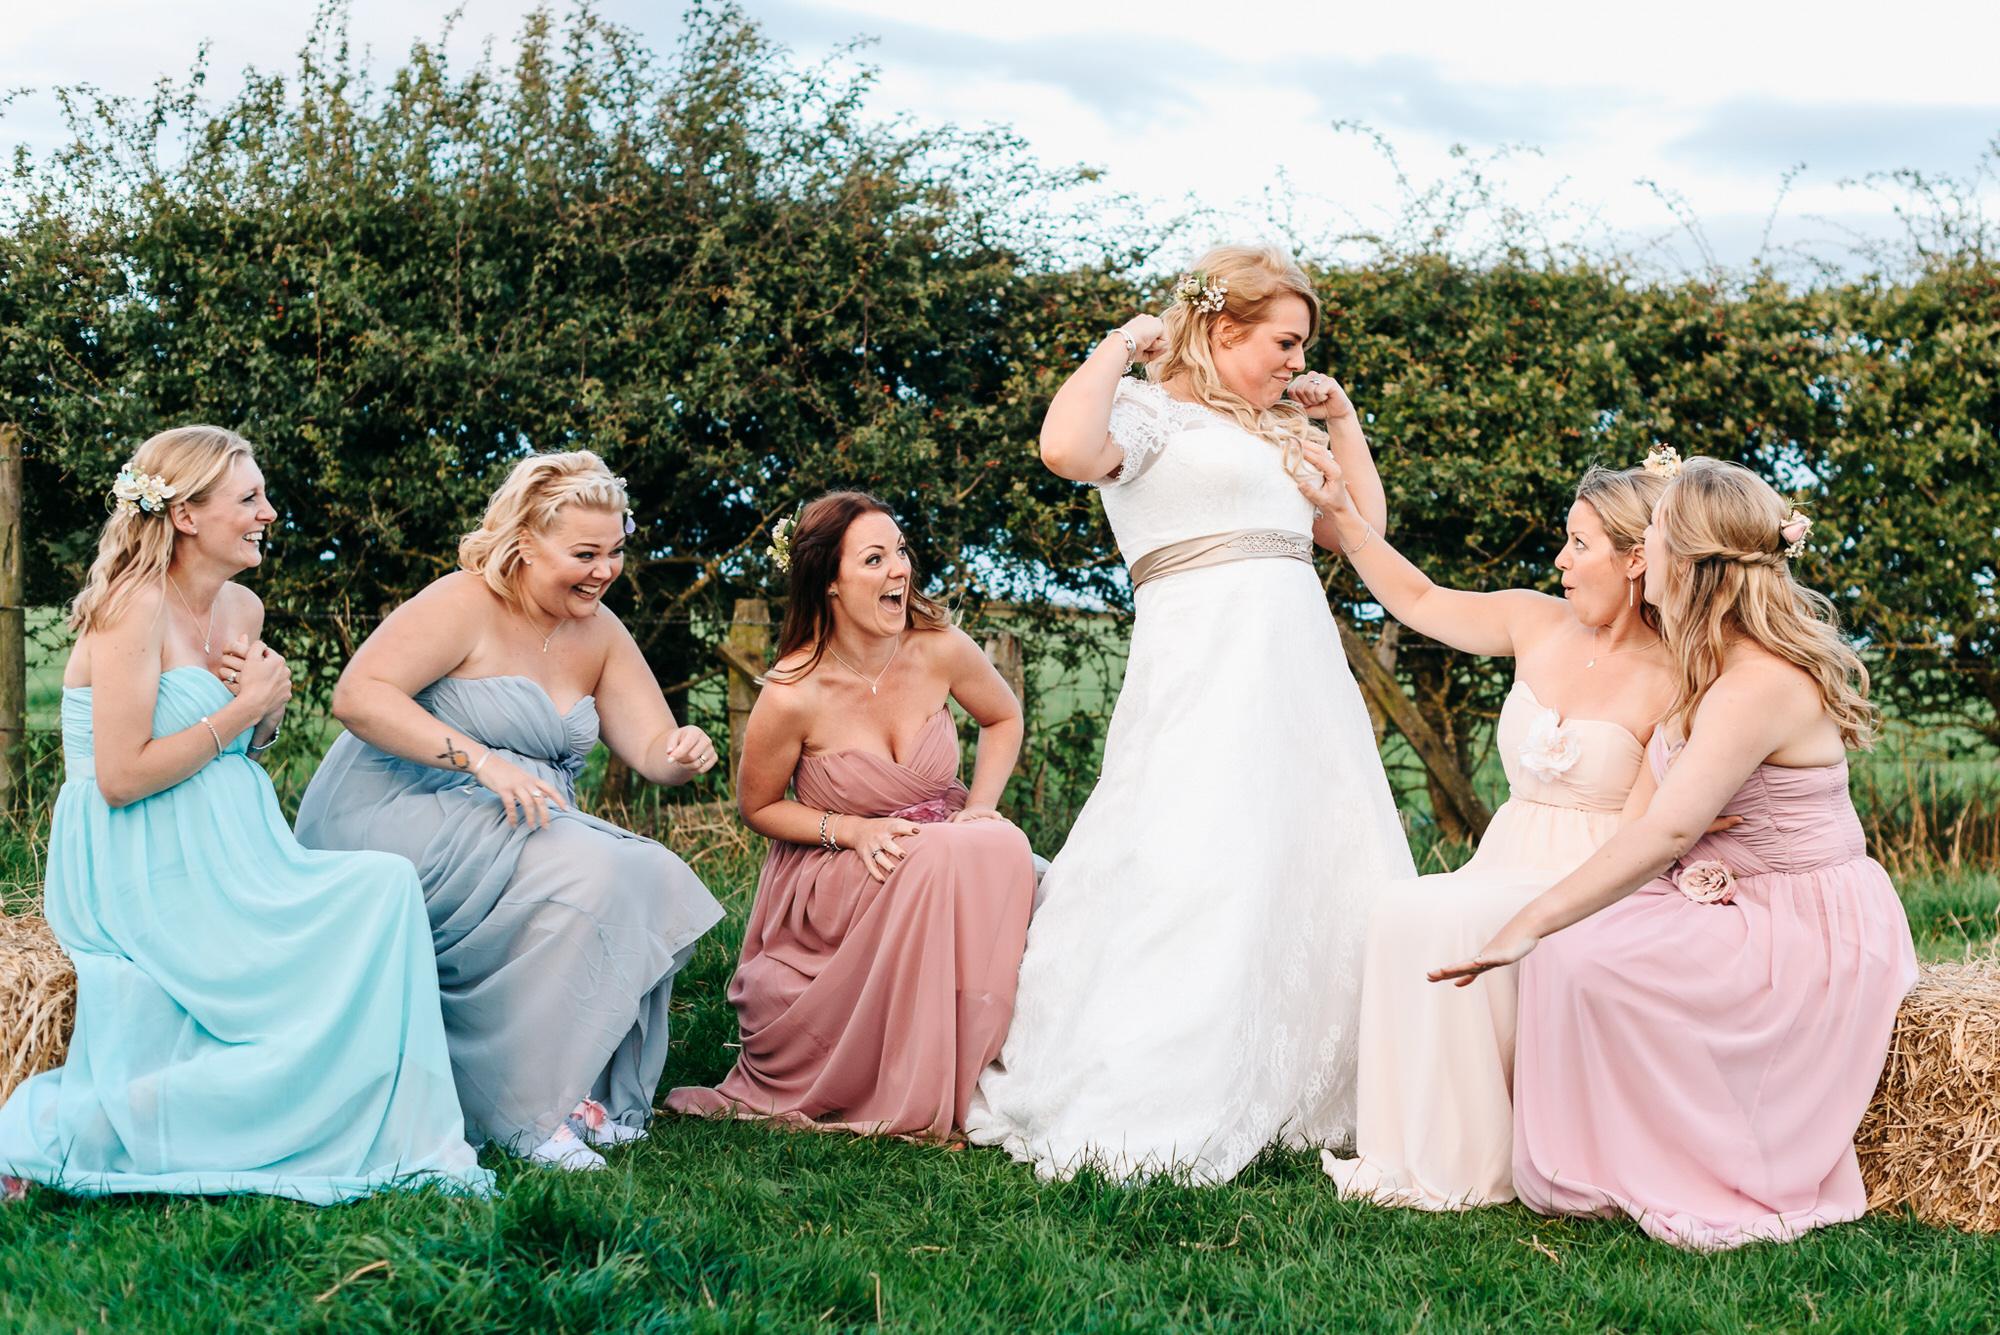 Best Of Yorkshire Wedding Photography 2017 - Martyn Hand-61.jpg